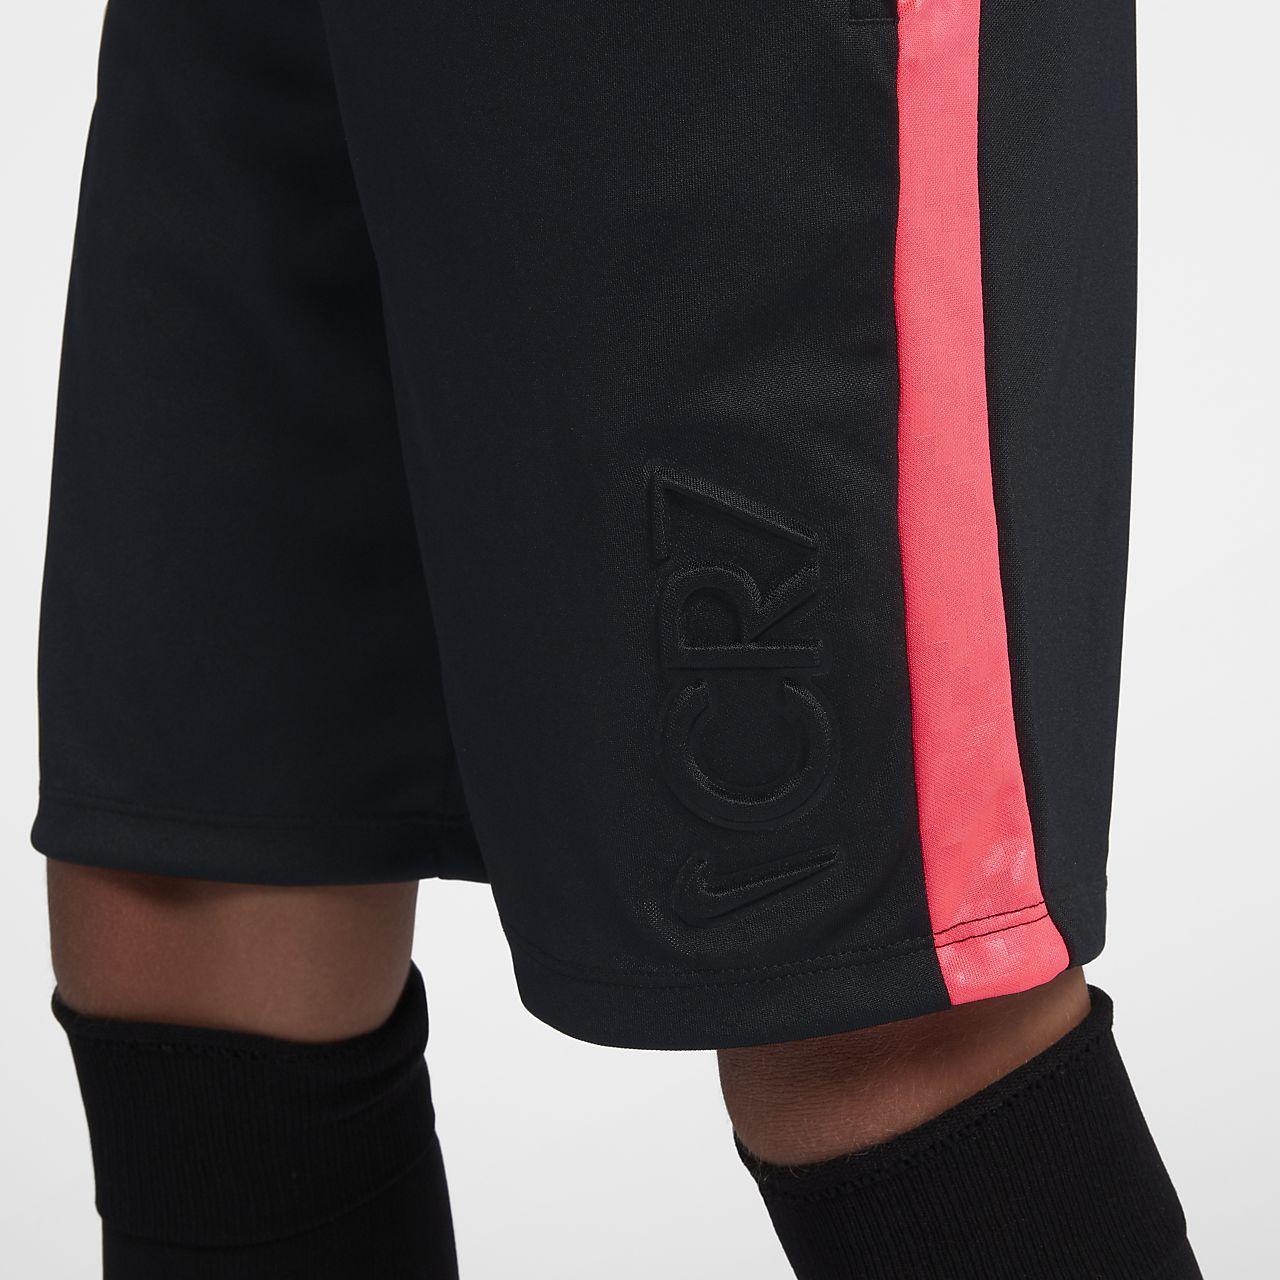 8d453293ae8a Nike Dri-FIT CR7 Older Kids  (Boys ) Football Shorts. Nike.com GB